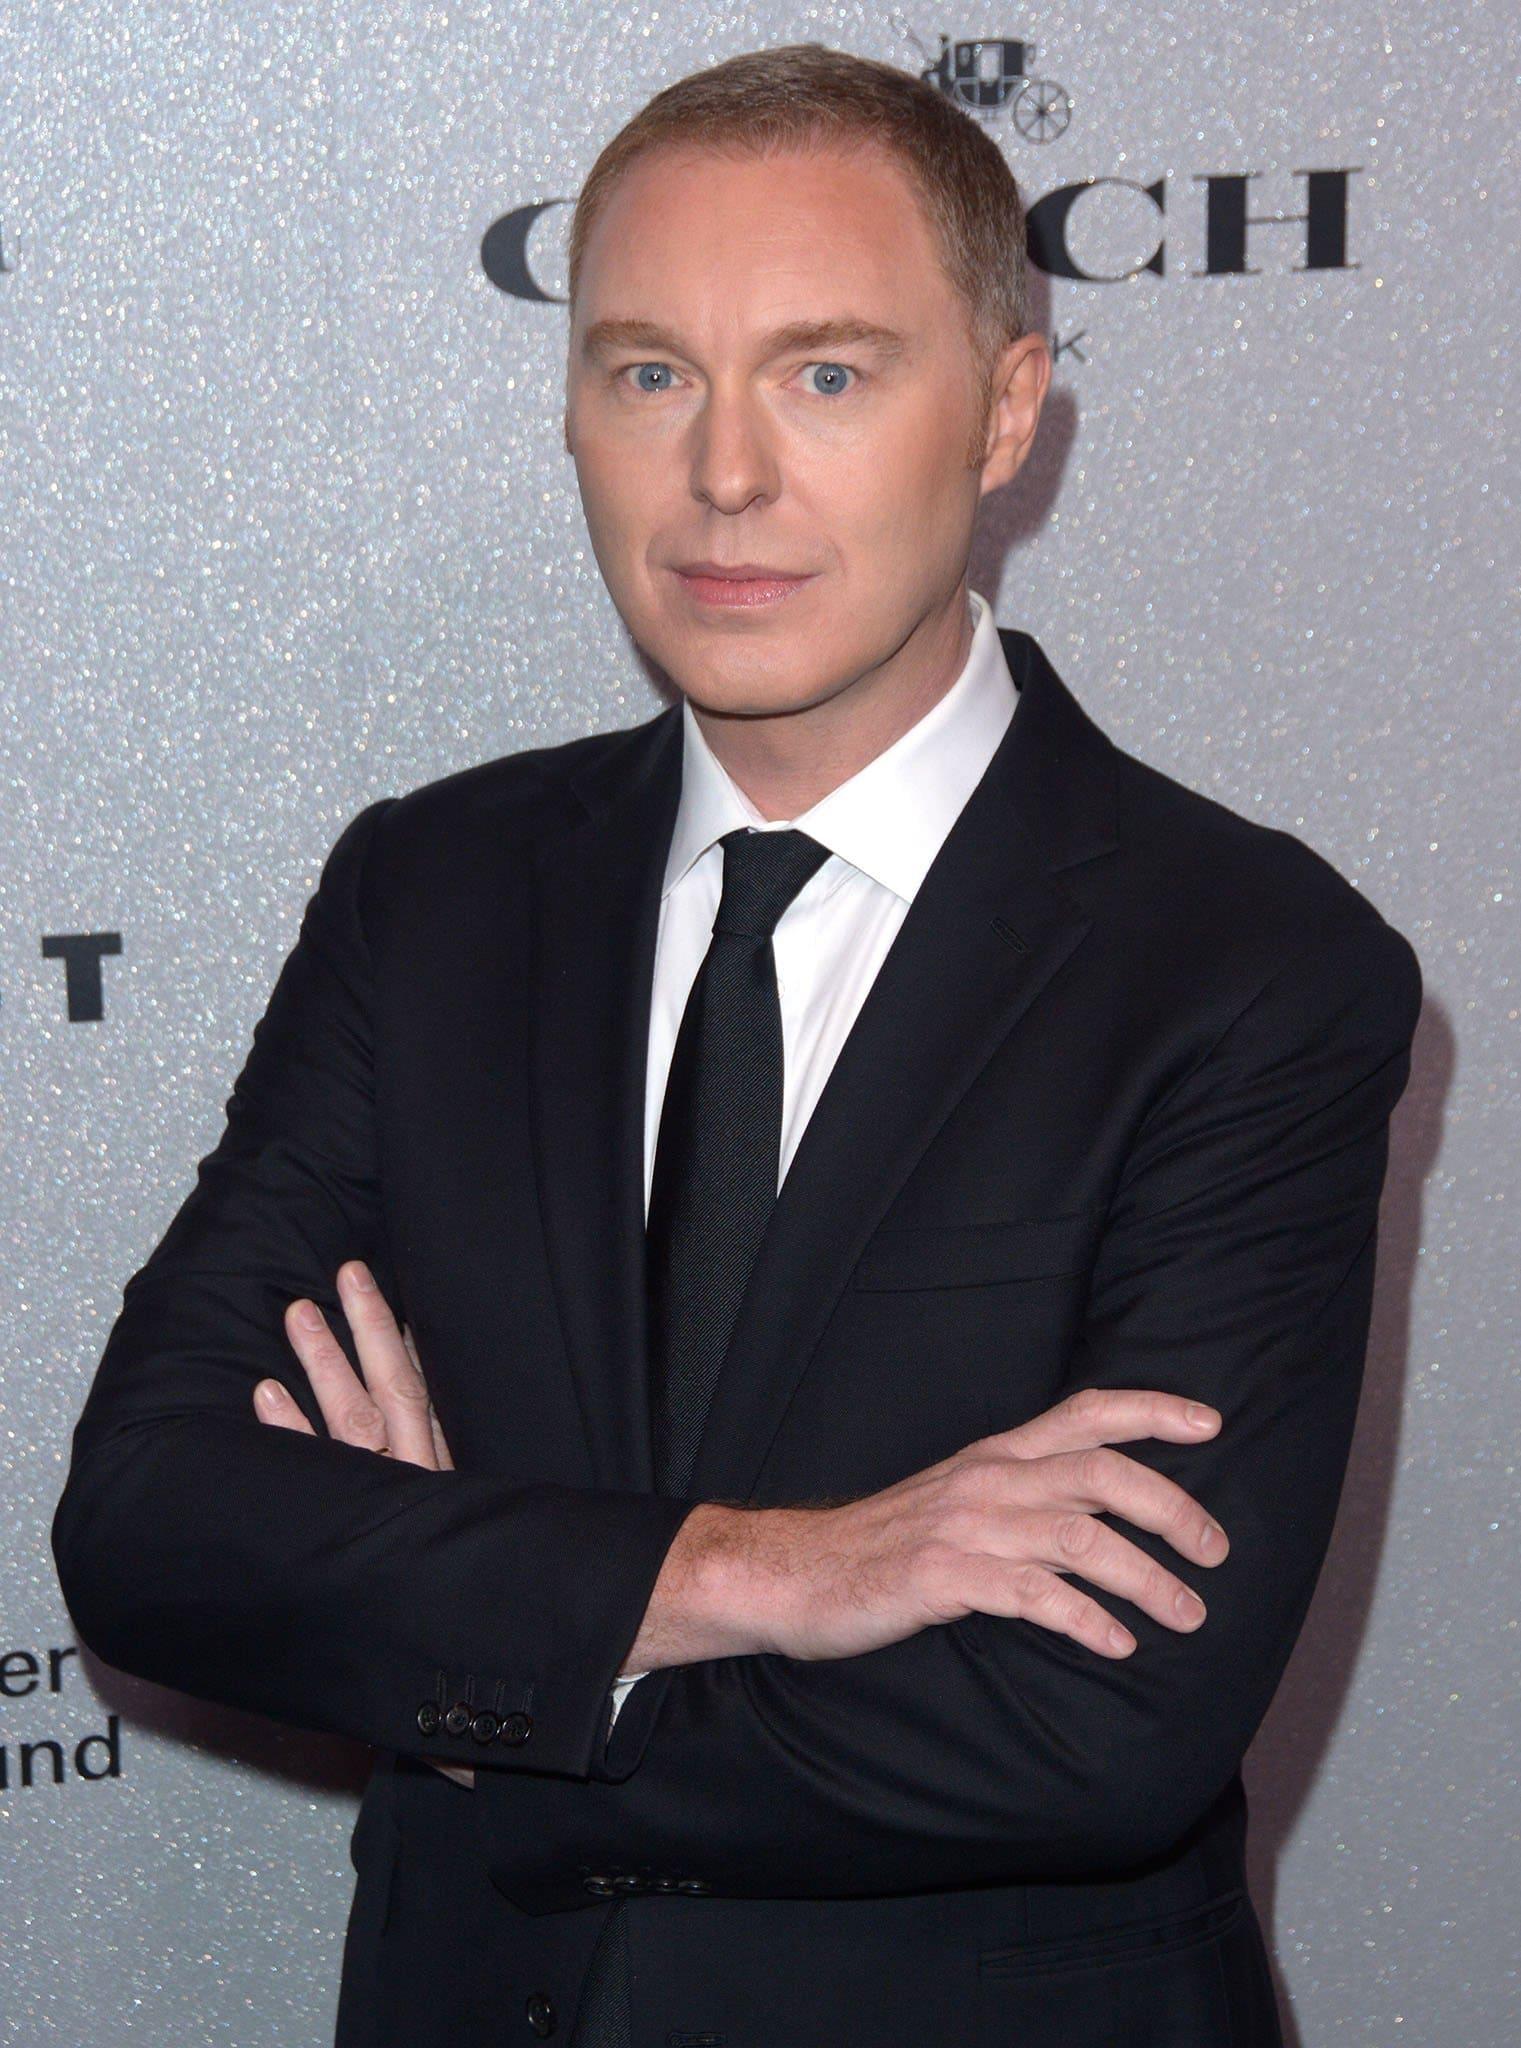 British fashion designer Stuart Vevers has served as Coach's executive creative director since 2013